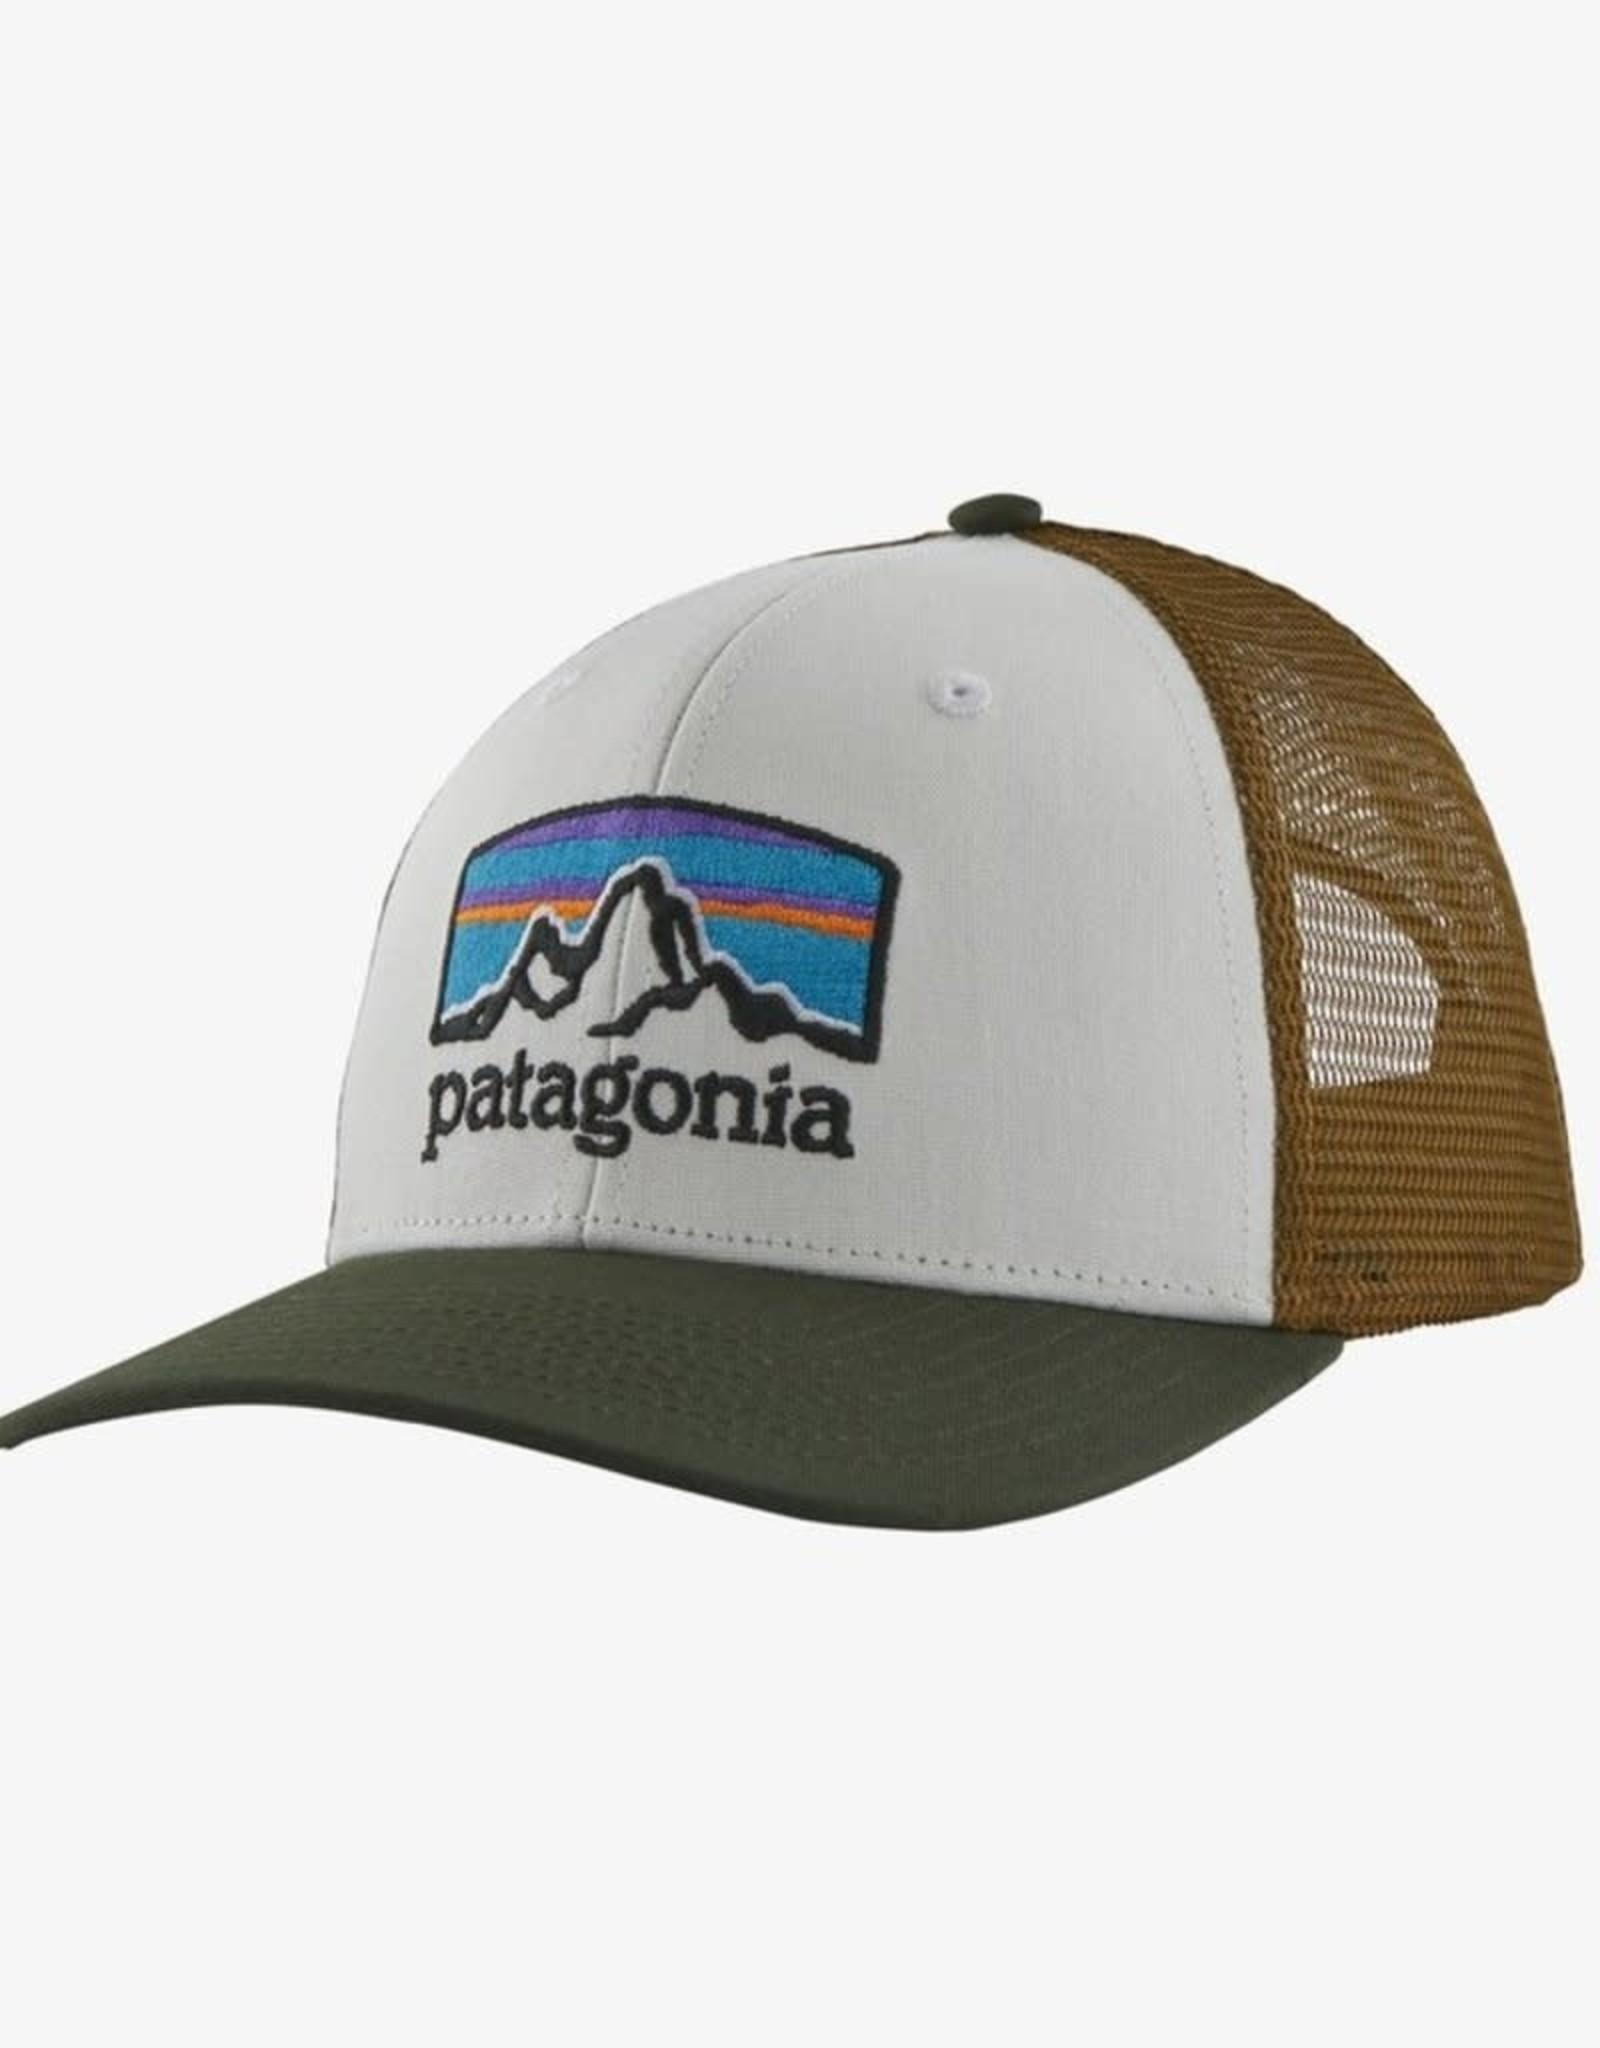 Patagonia Fitz Roy Horizons Trucker Hat (White w/ Kelp Forest)